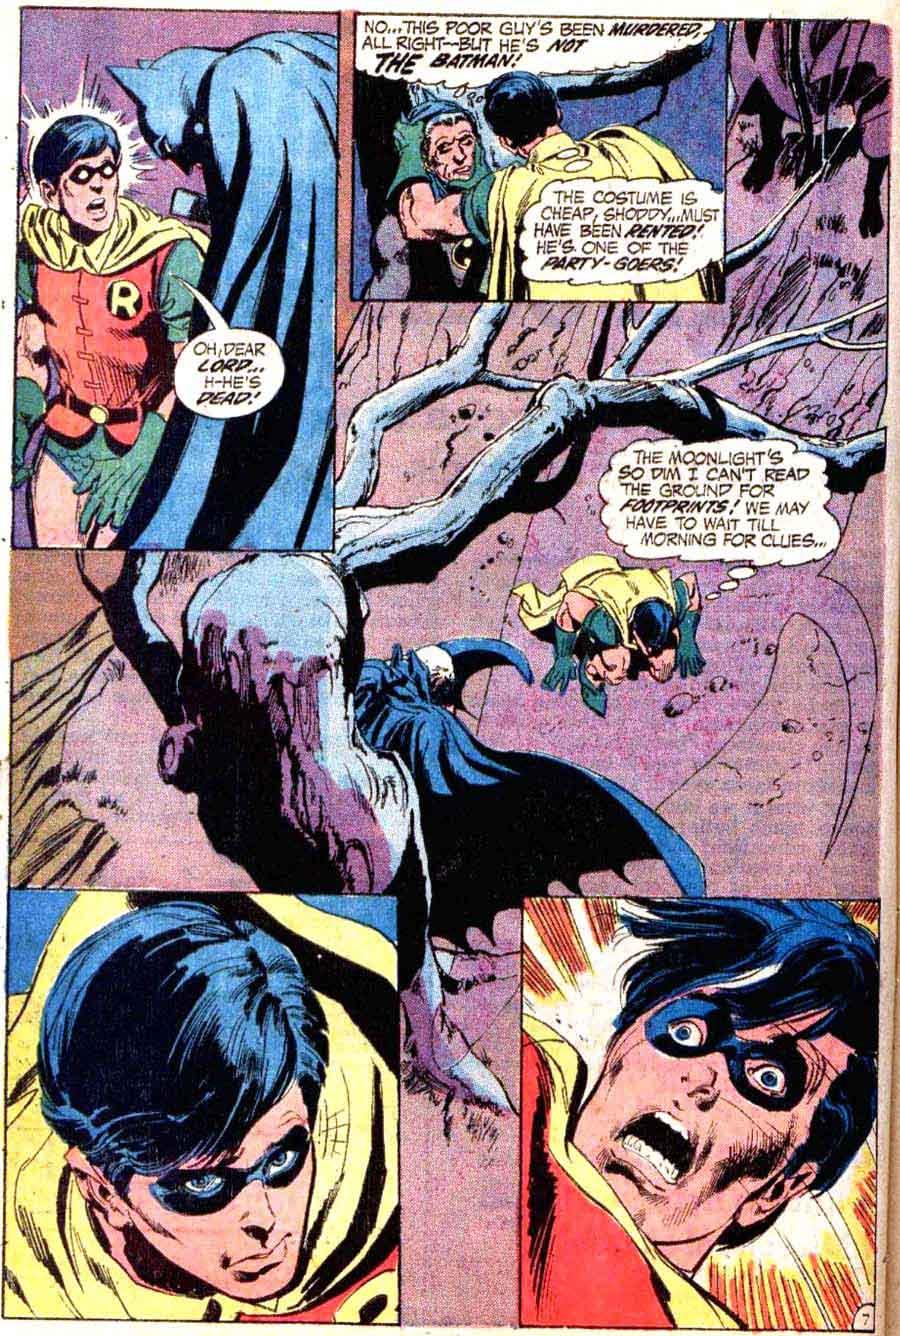 Batman v1 #237 dc comic book page art by Neal Adams